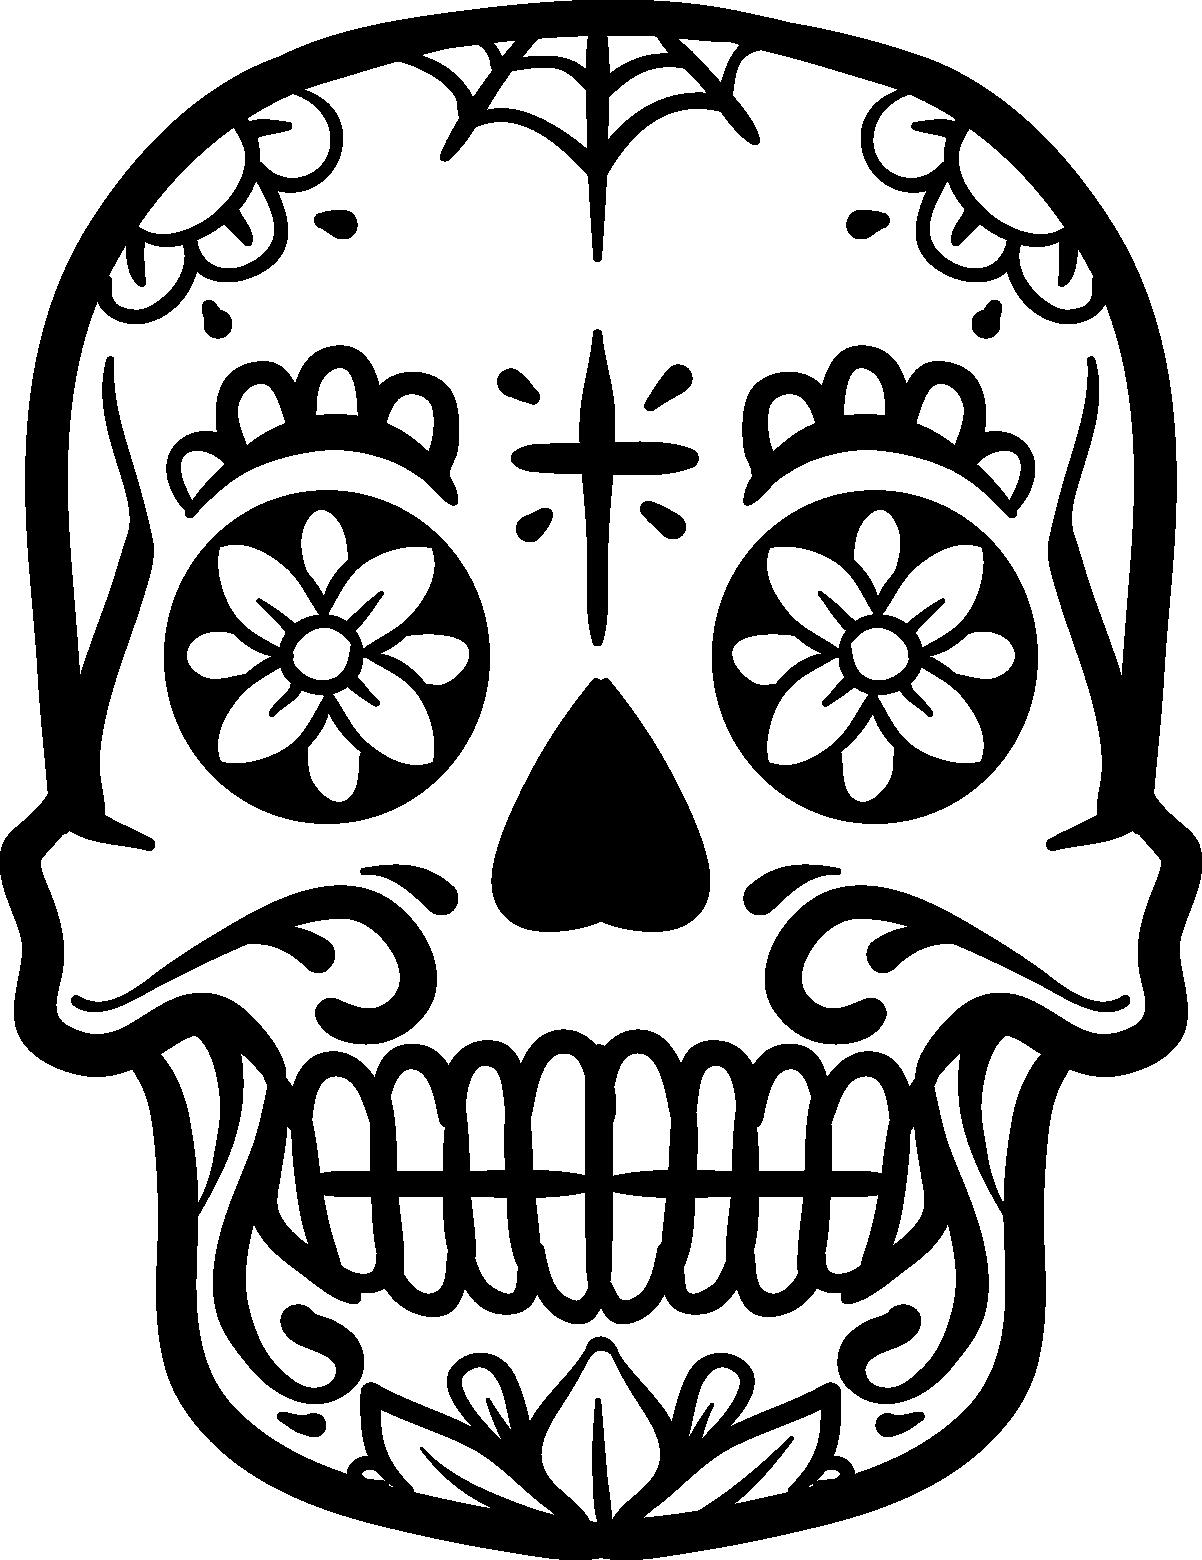 Sugarskull 2